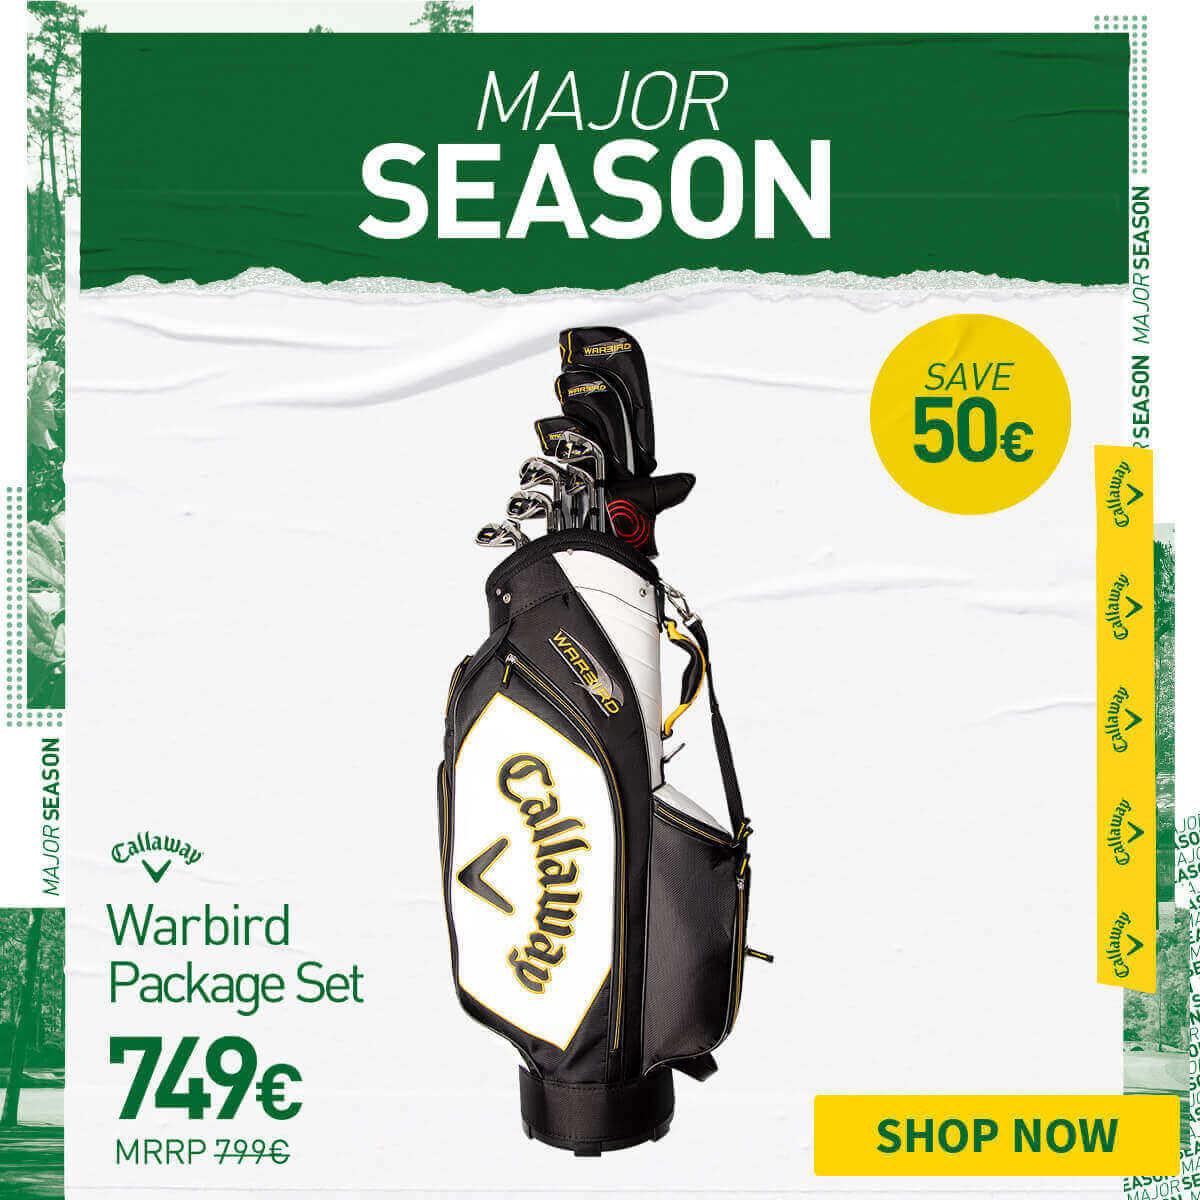 CALLAWAY WARBIRD PACKAGE SET - SAVE £50